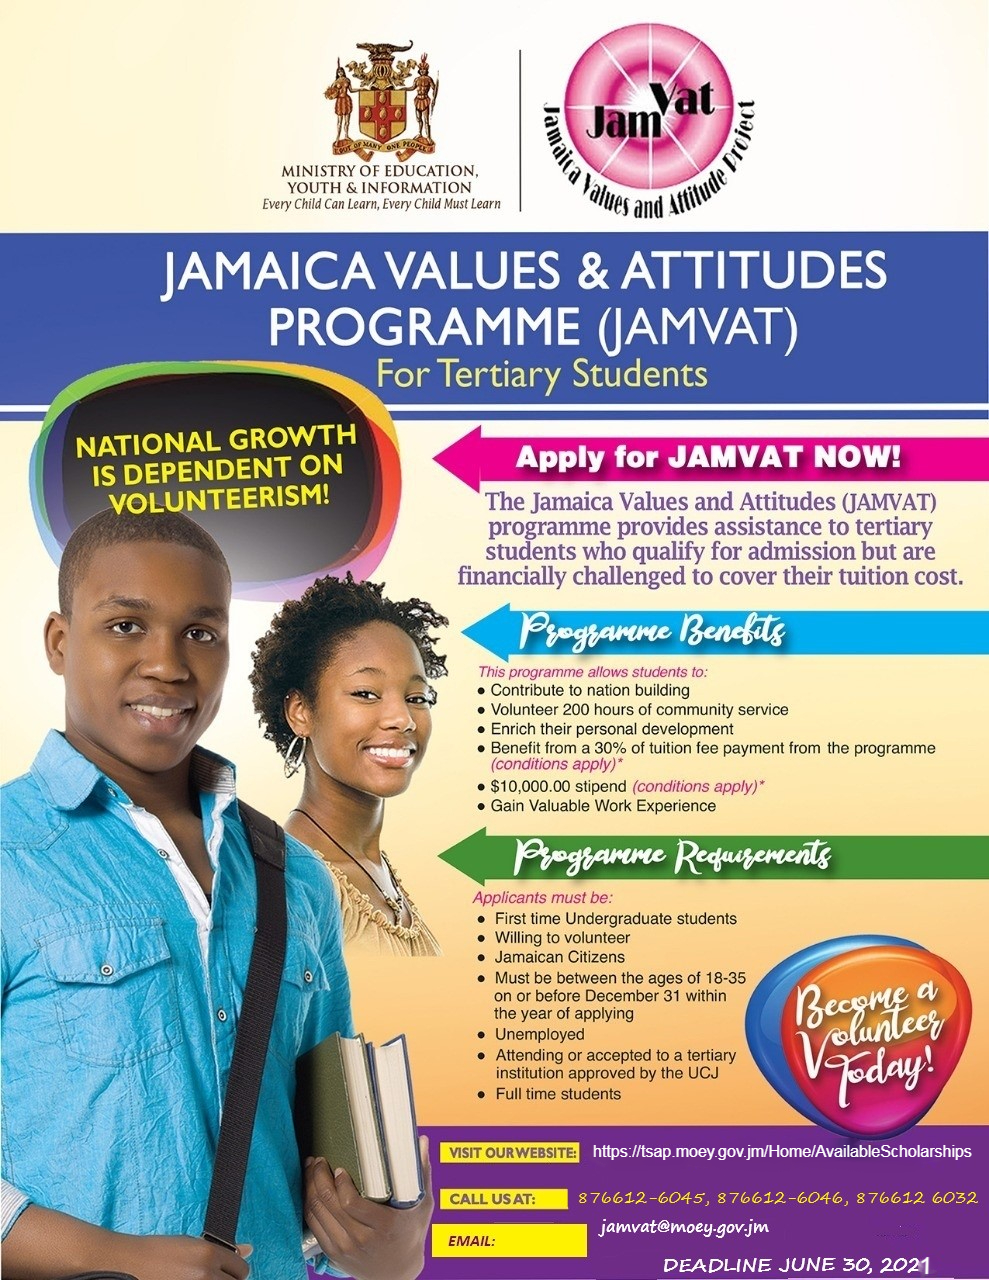 Jamaica Values and Attitudes Programme (JAMVAT)